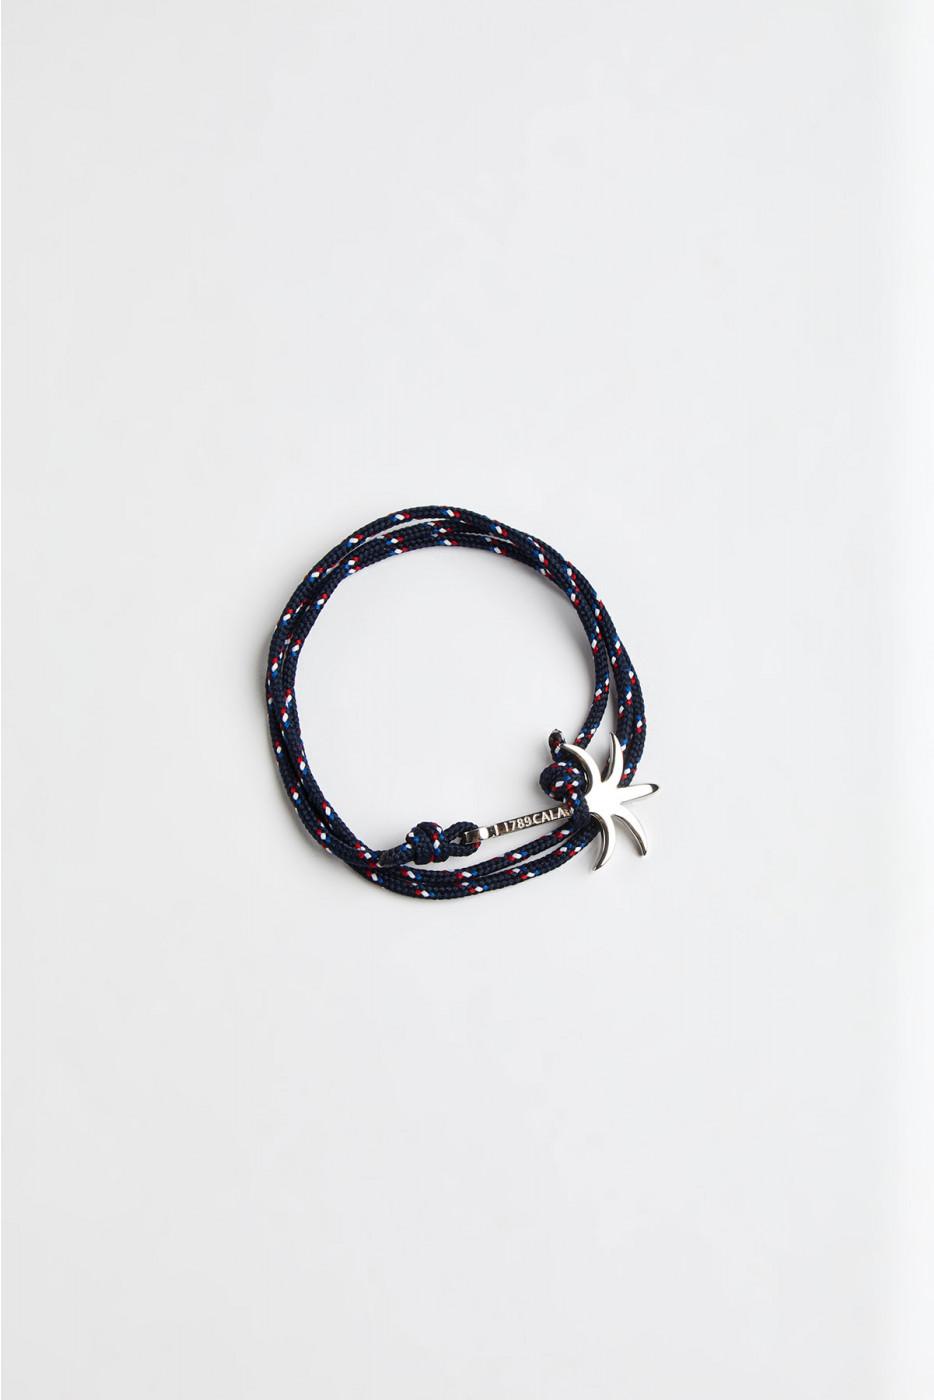 Bracelet Corde Marine - PALMIER BRACELET